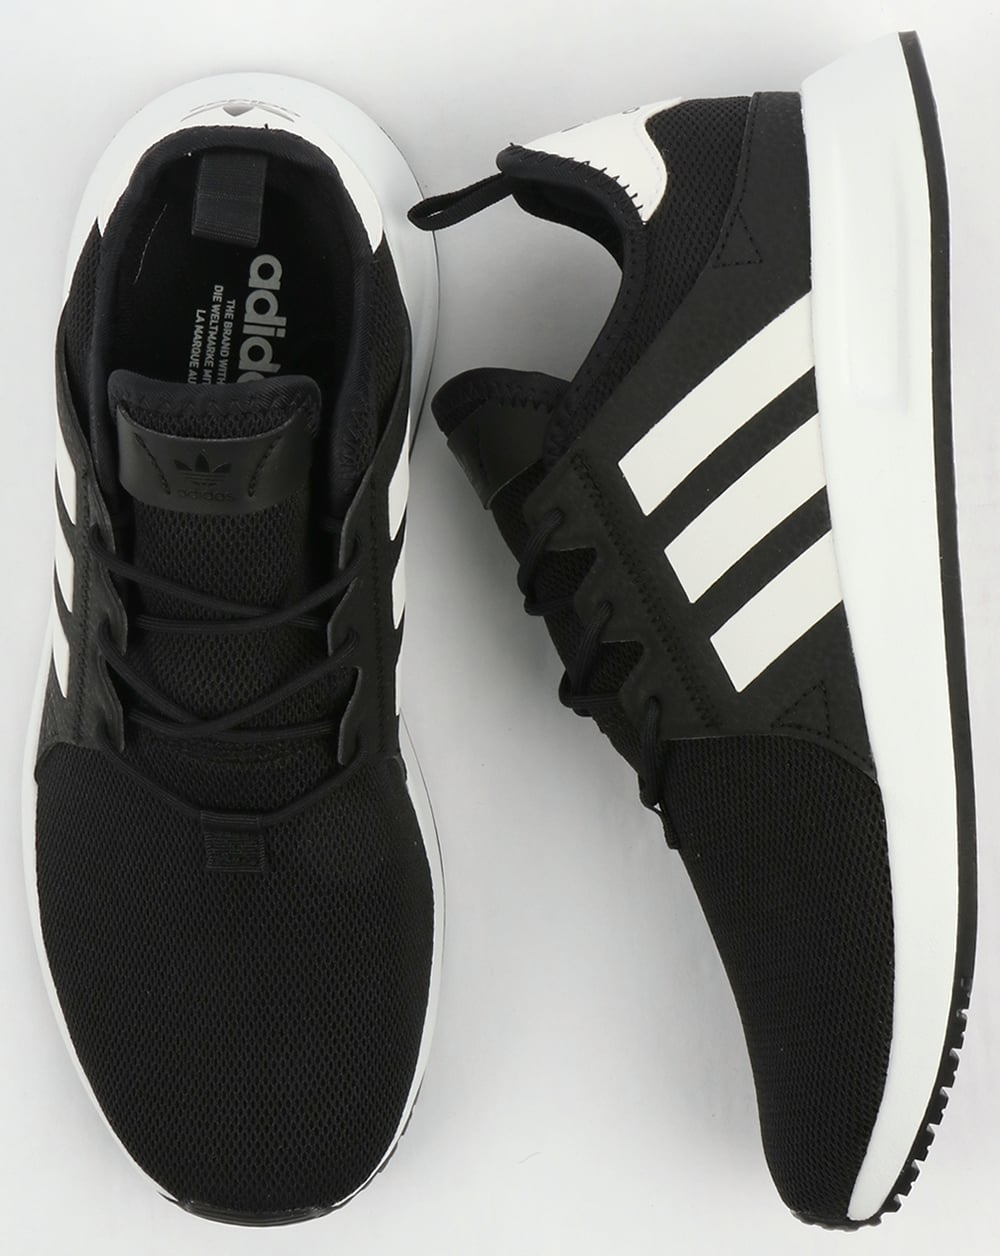 low priced 6ba4d 41981 Adidas XPLR Trainers Black White